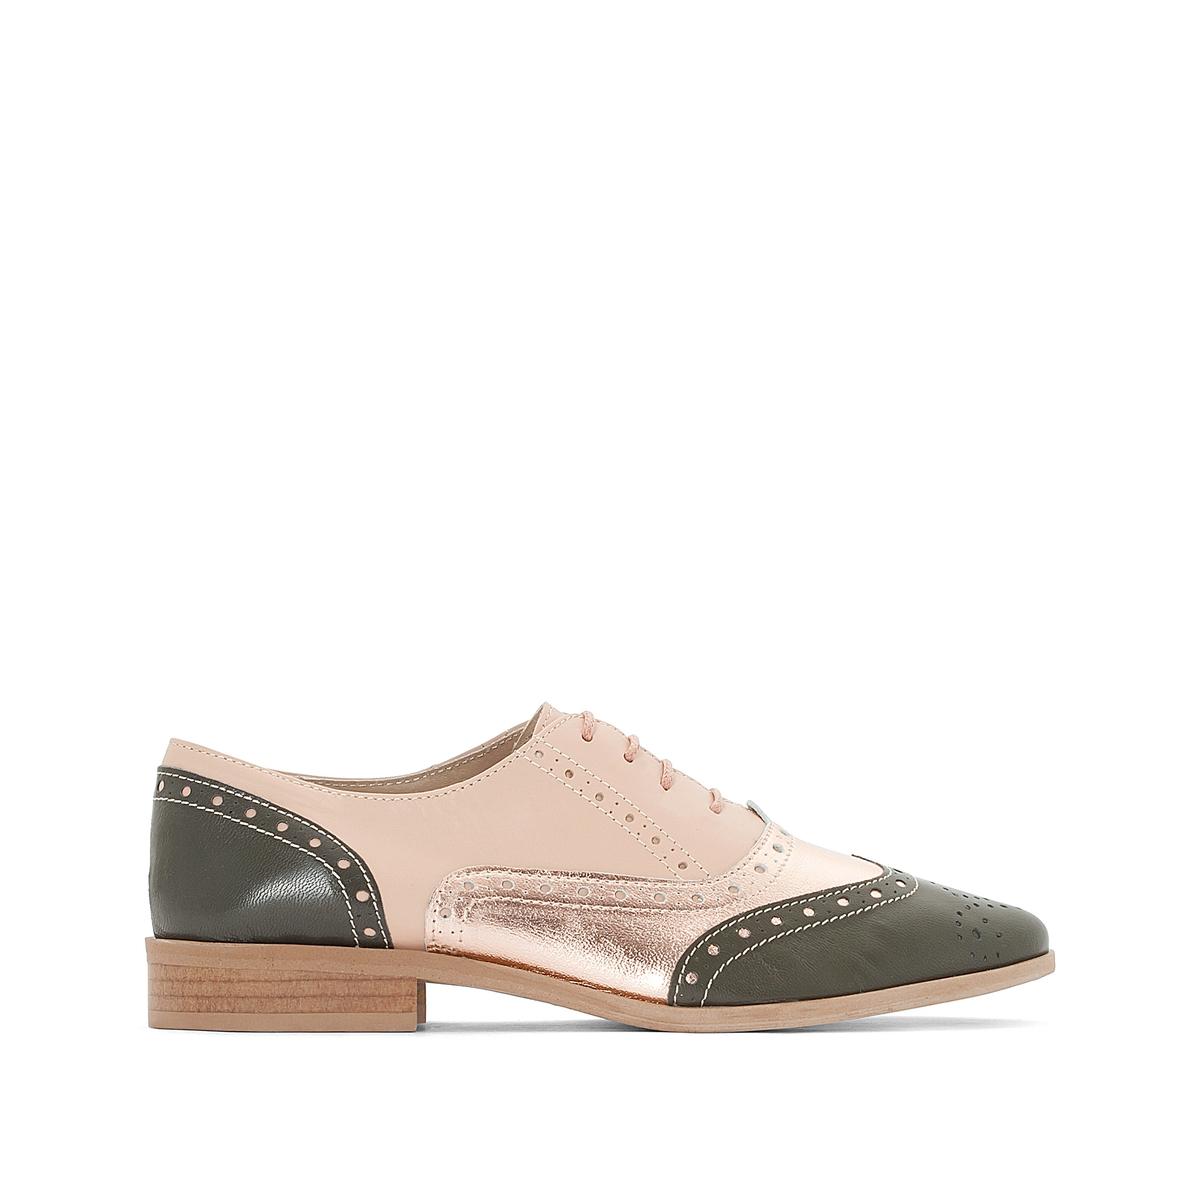 Ботинки-дерби из кожи с цветочным узором ботинки дерби из мягкой кожи takarika